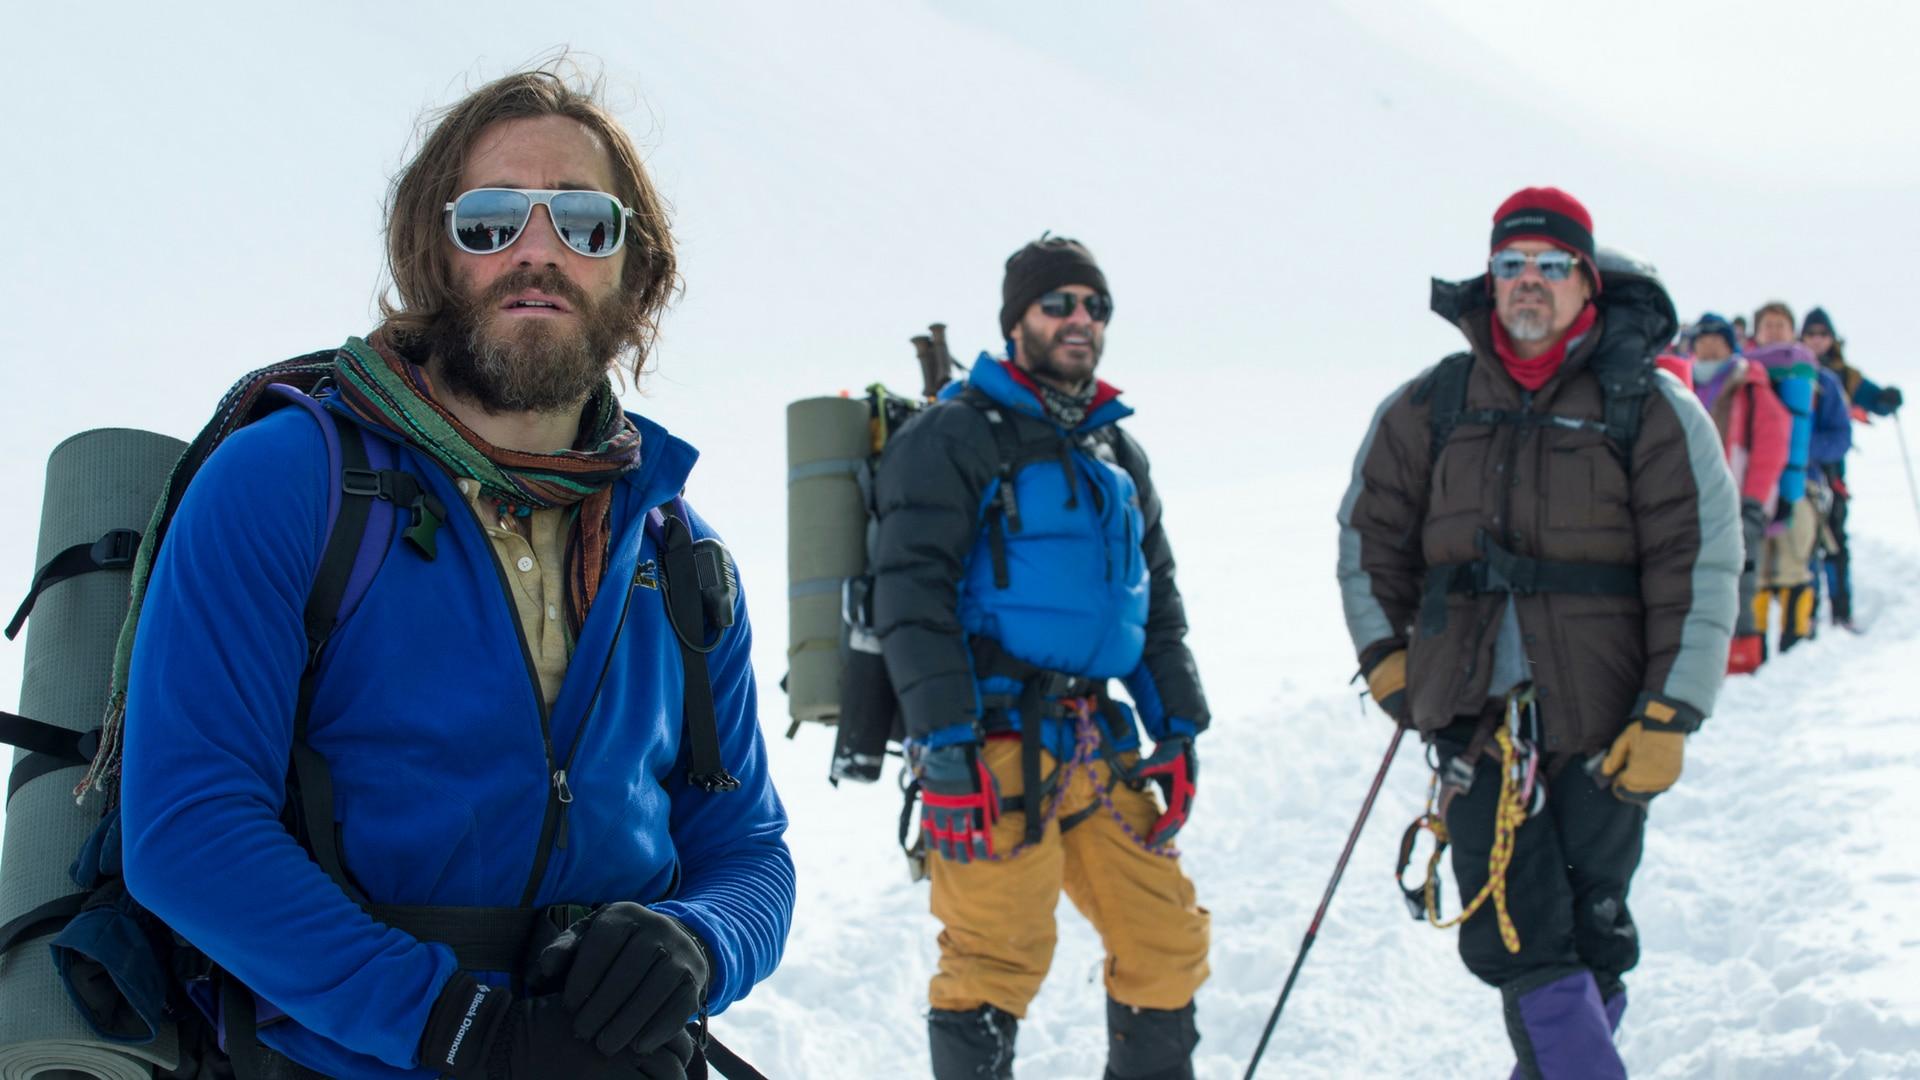 Everest on Film4